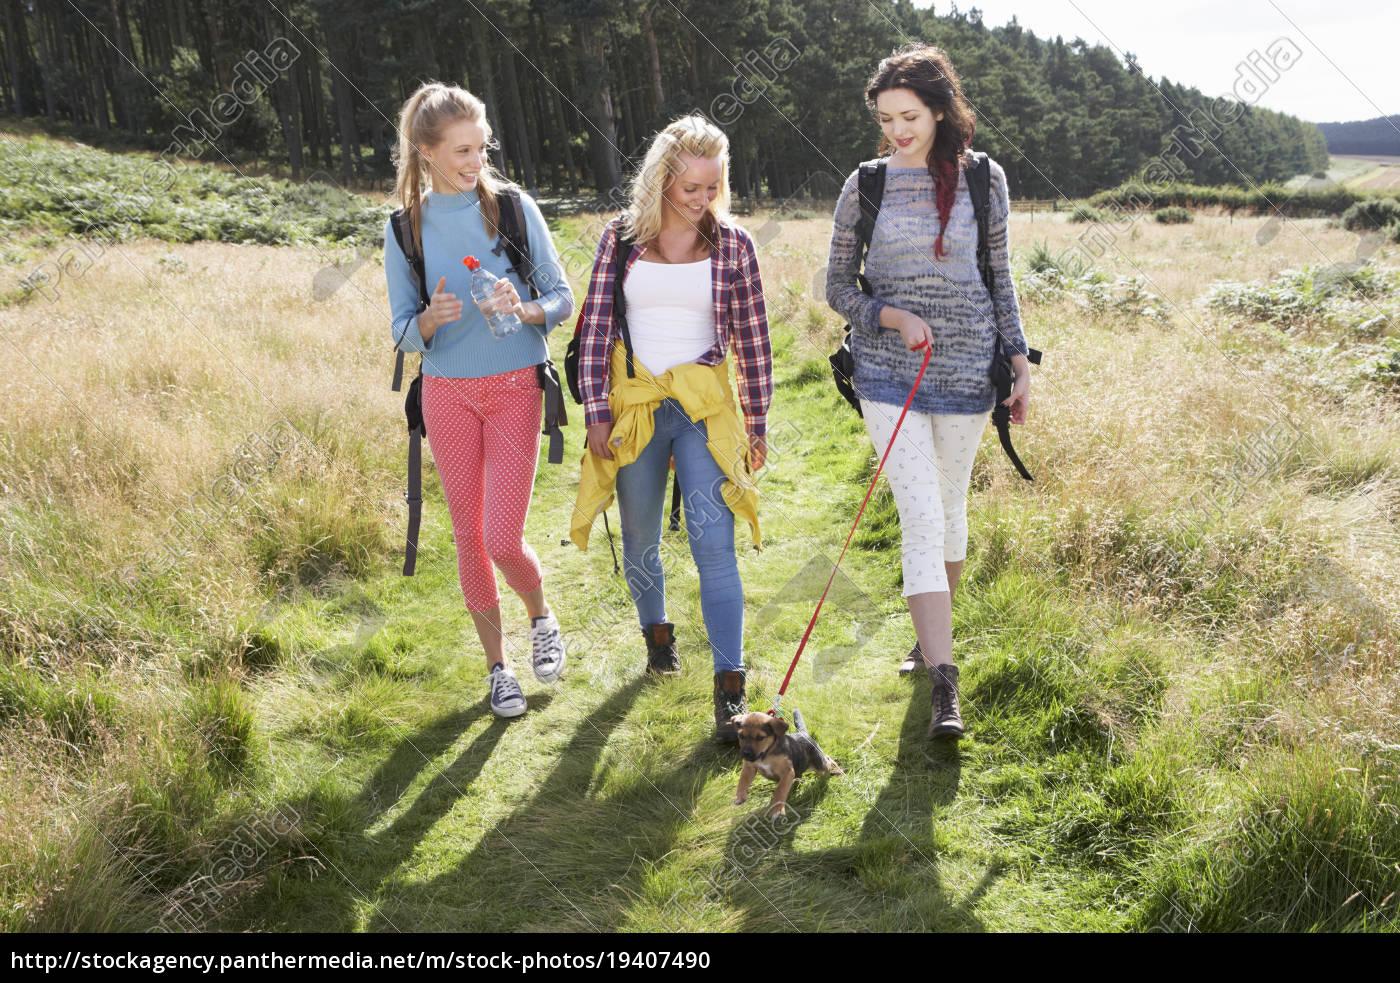 group, of, teenage, girls, hiking, in - 19407490